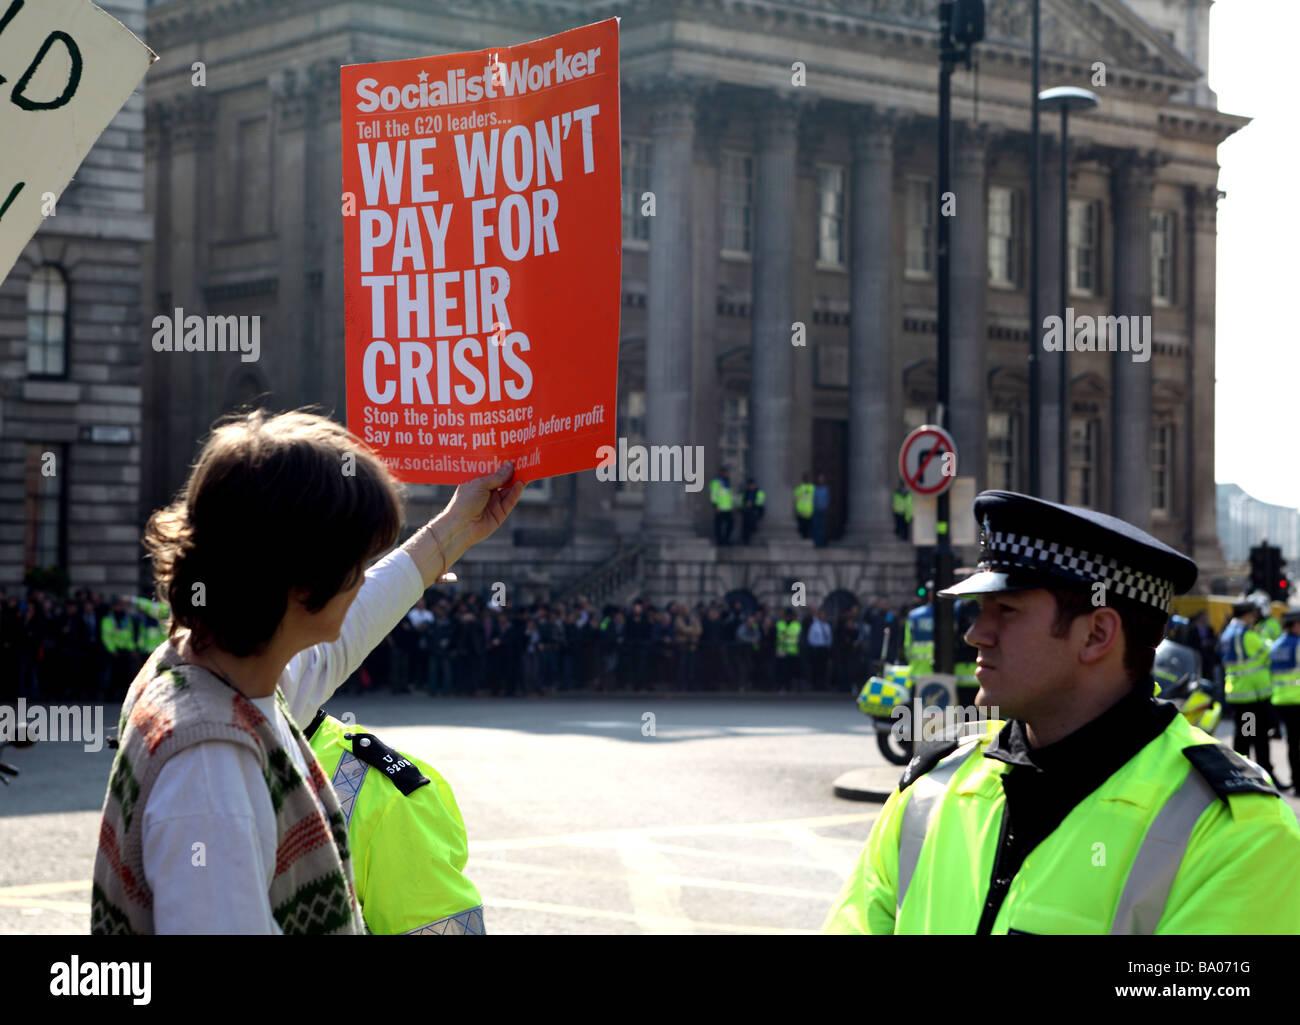 Demonstrant außerhalb der Bank of England während der 2009 G20-Gipfel, London, UK. Stockbild